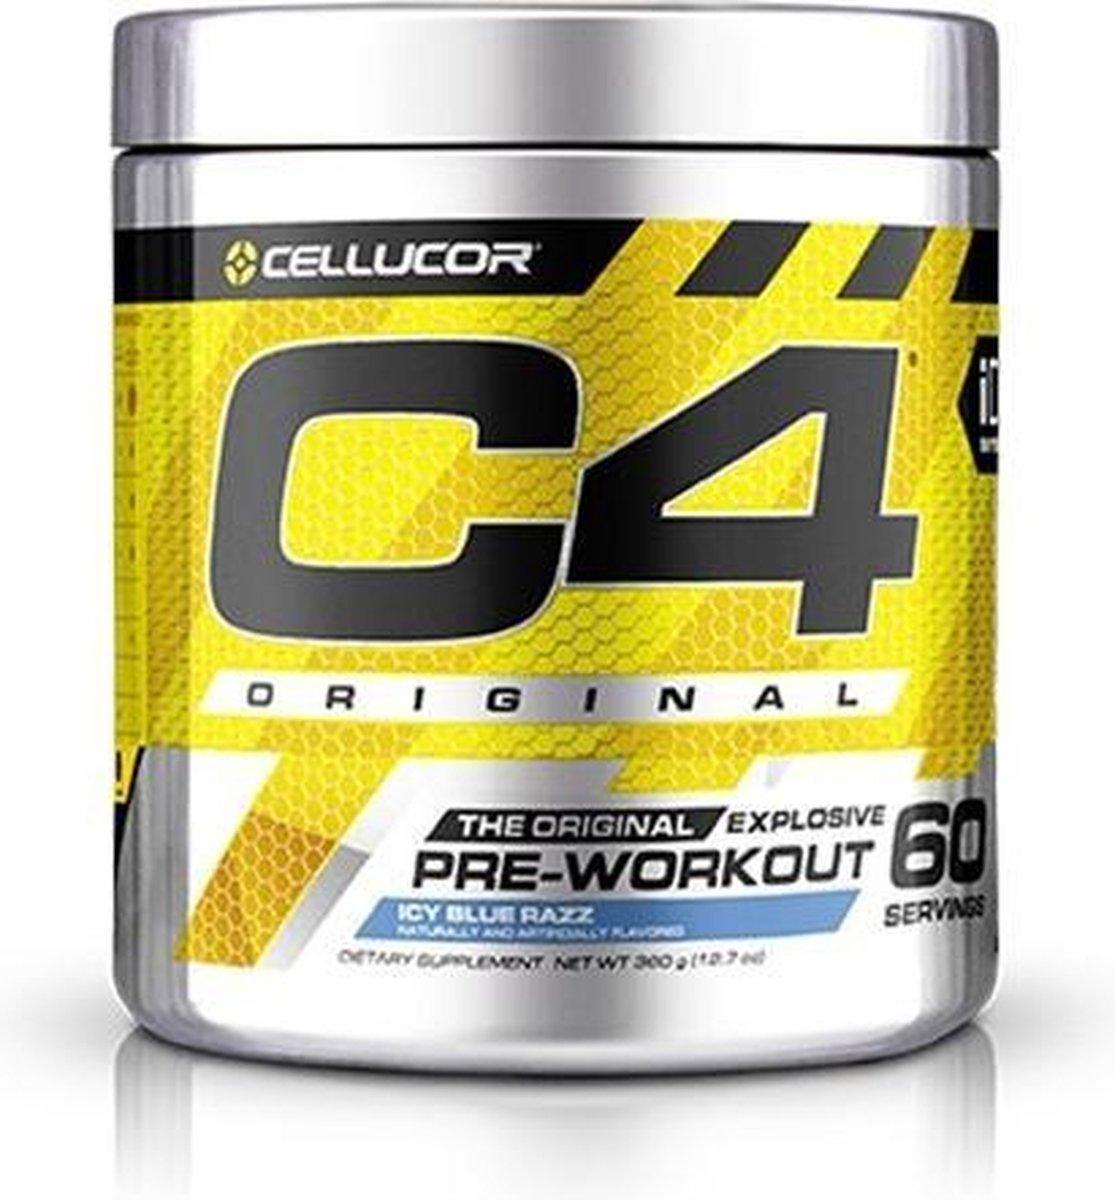 Cellucor C4 Original Pre-Workout - 60 Doseringen - Icy Blue Razz